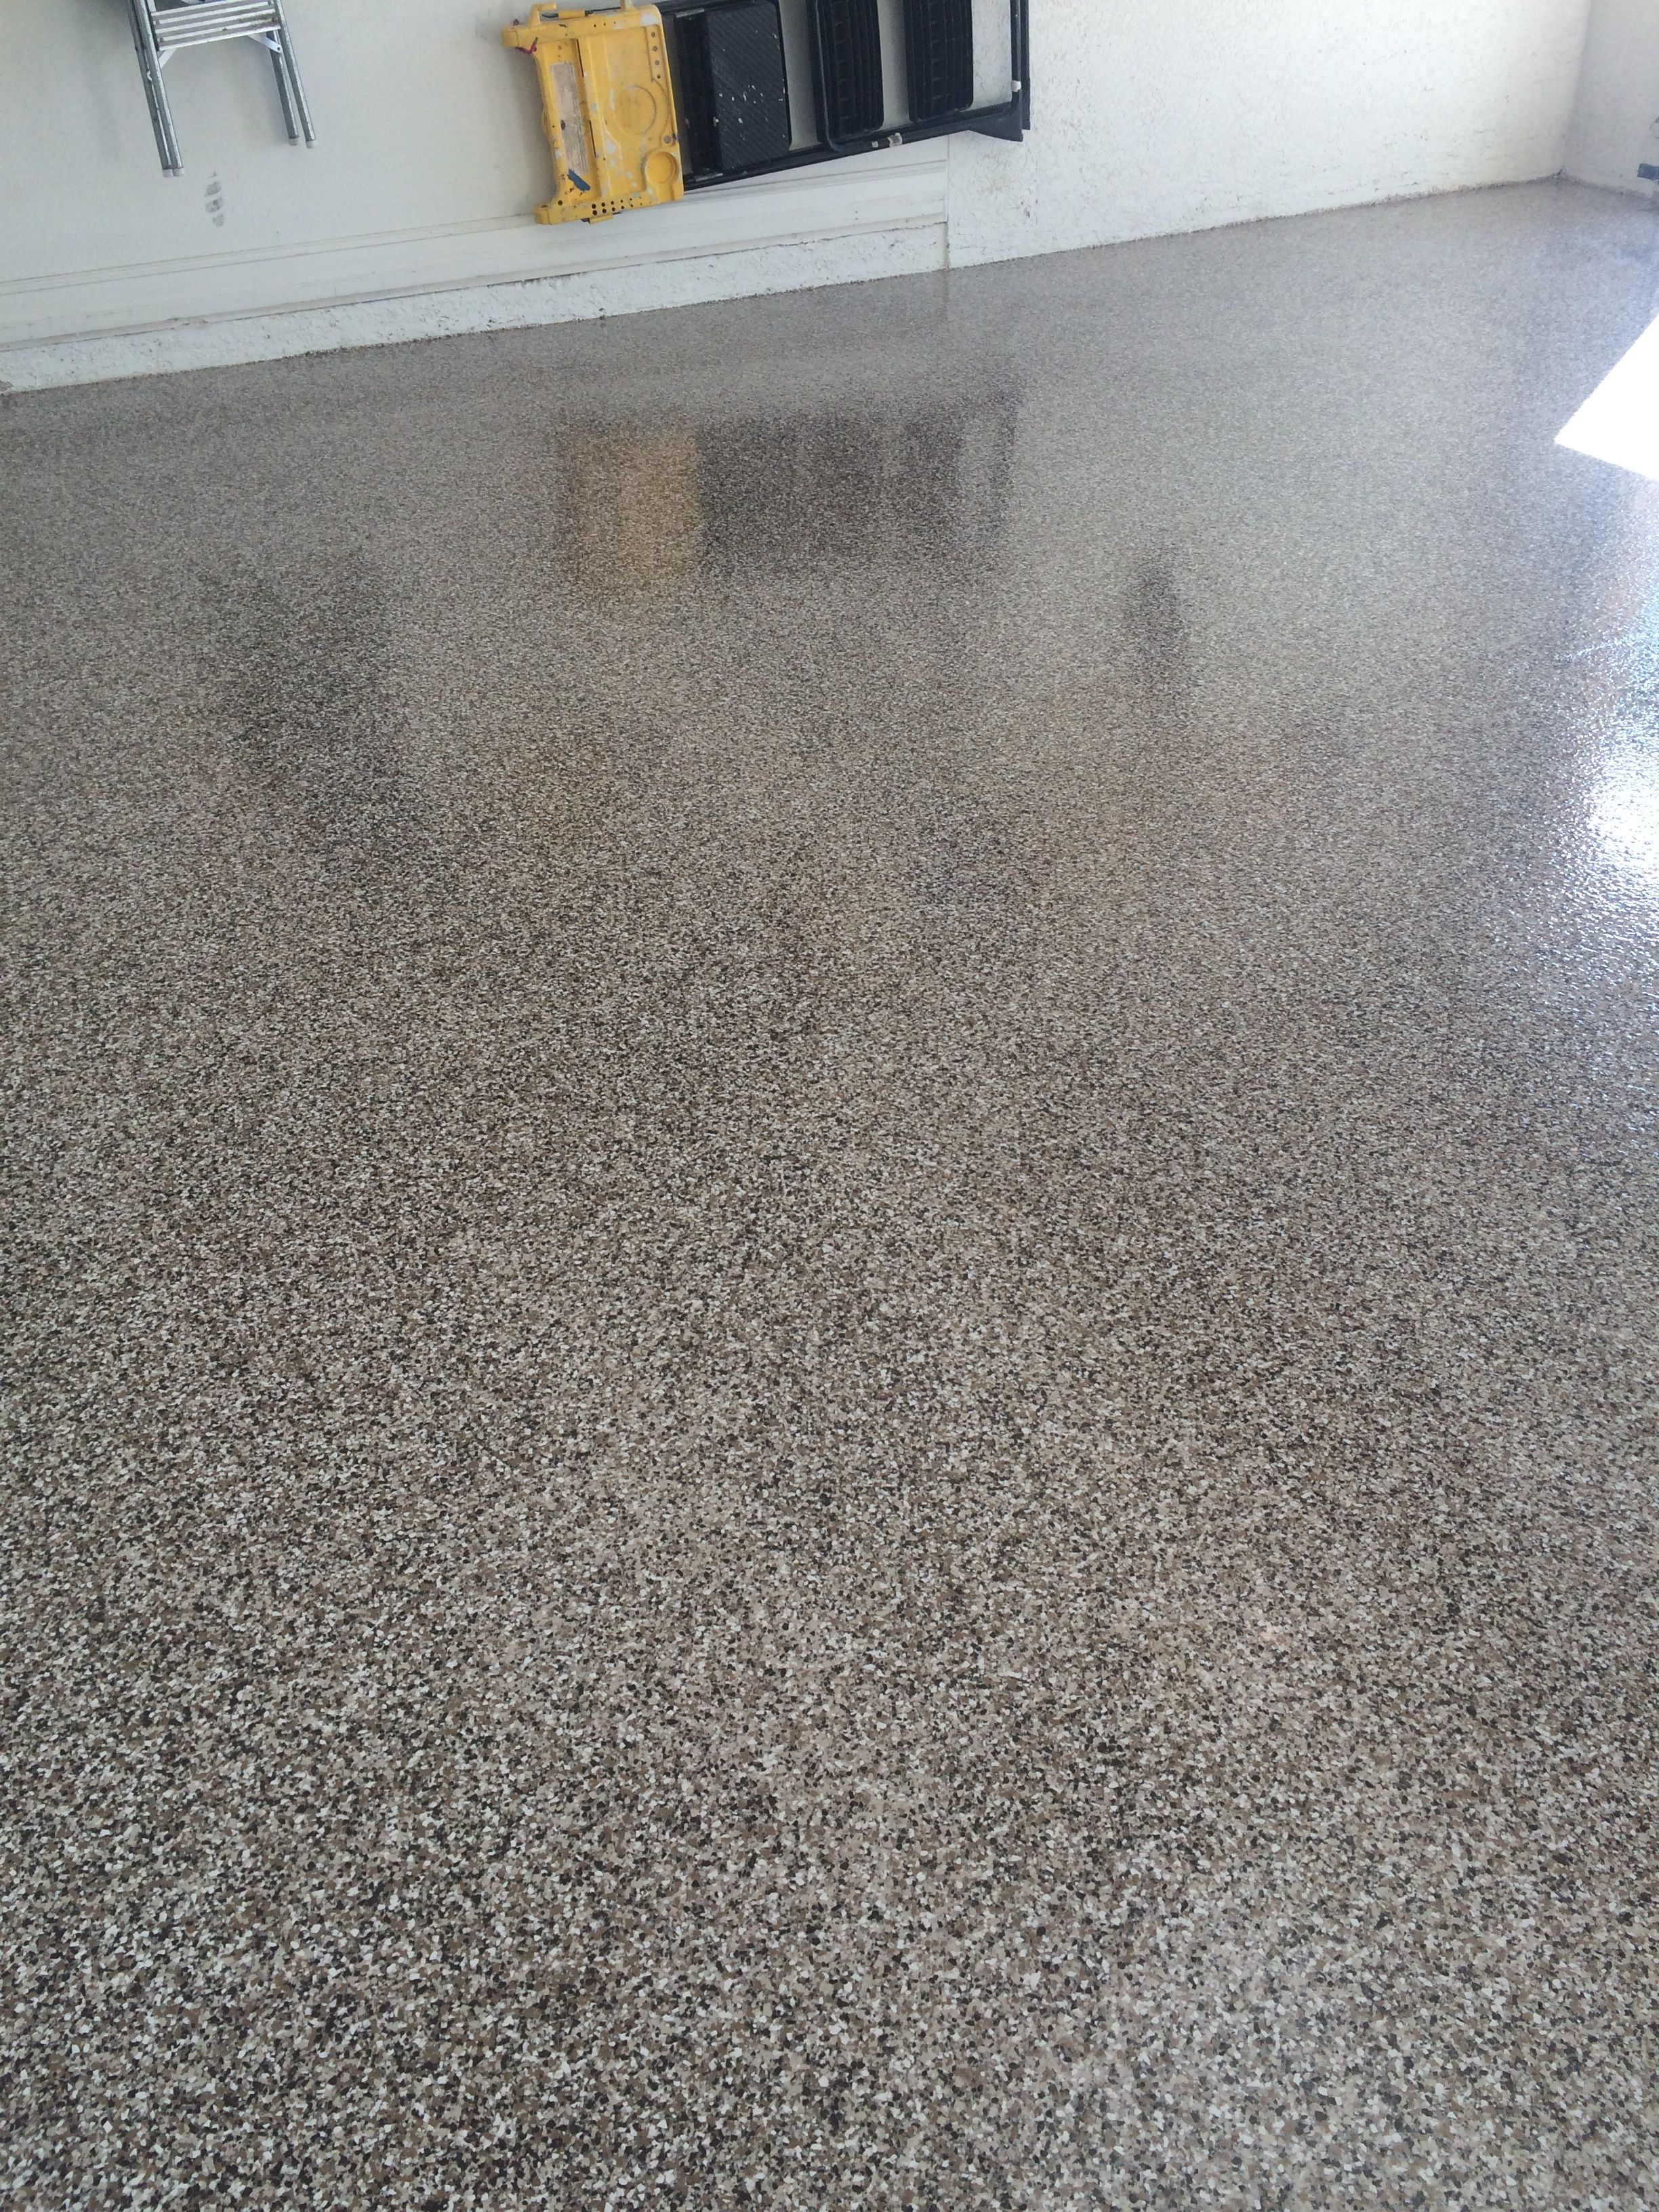 Pin by GarageFeet Floor Coatings on Decorative Full Flake